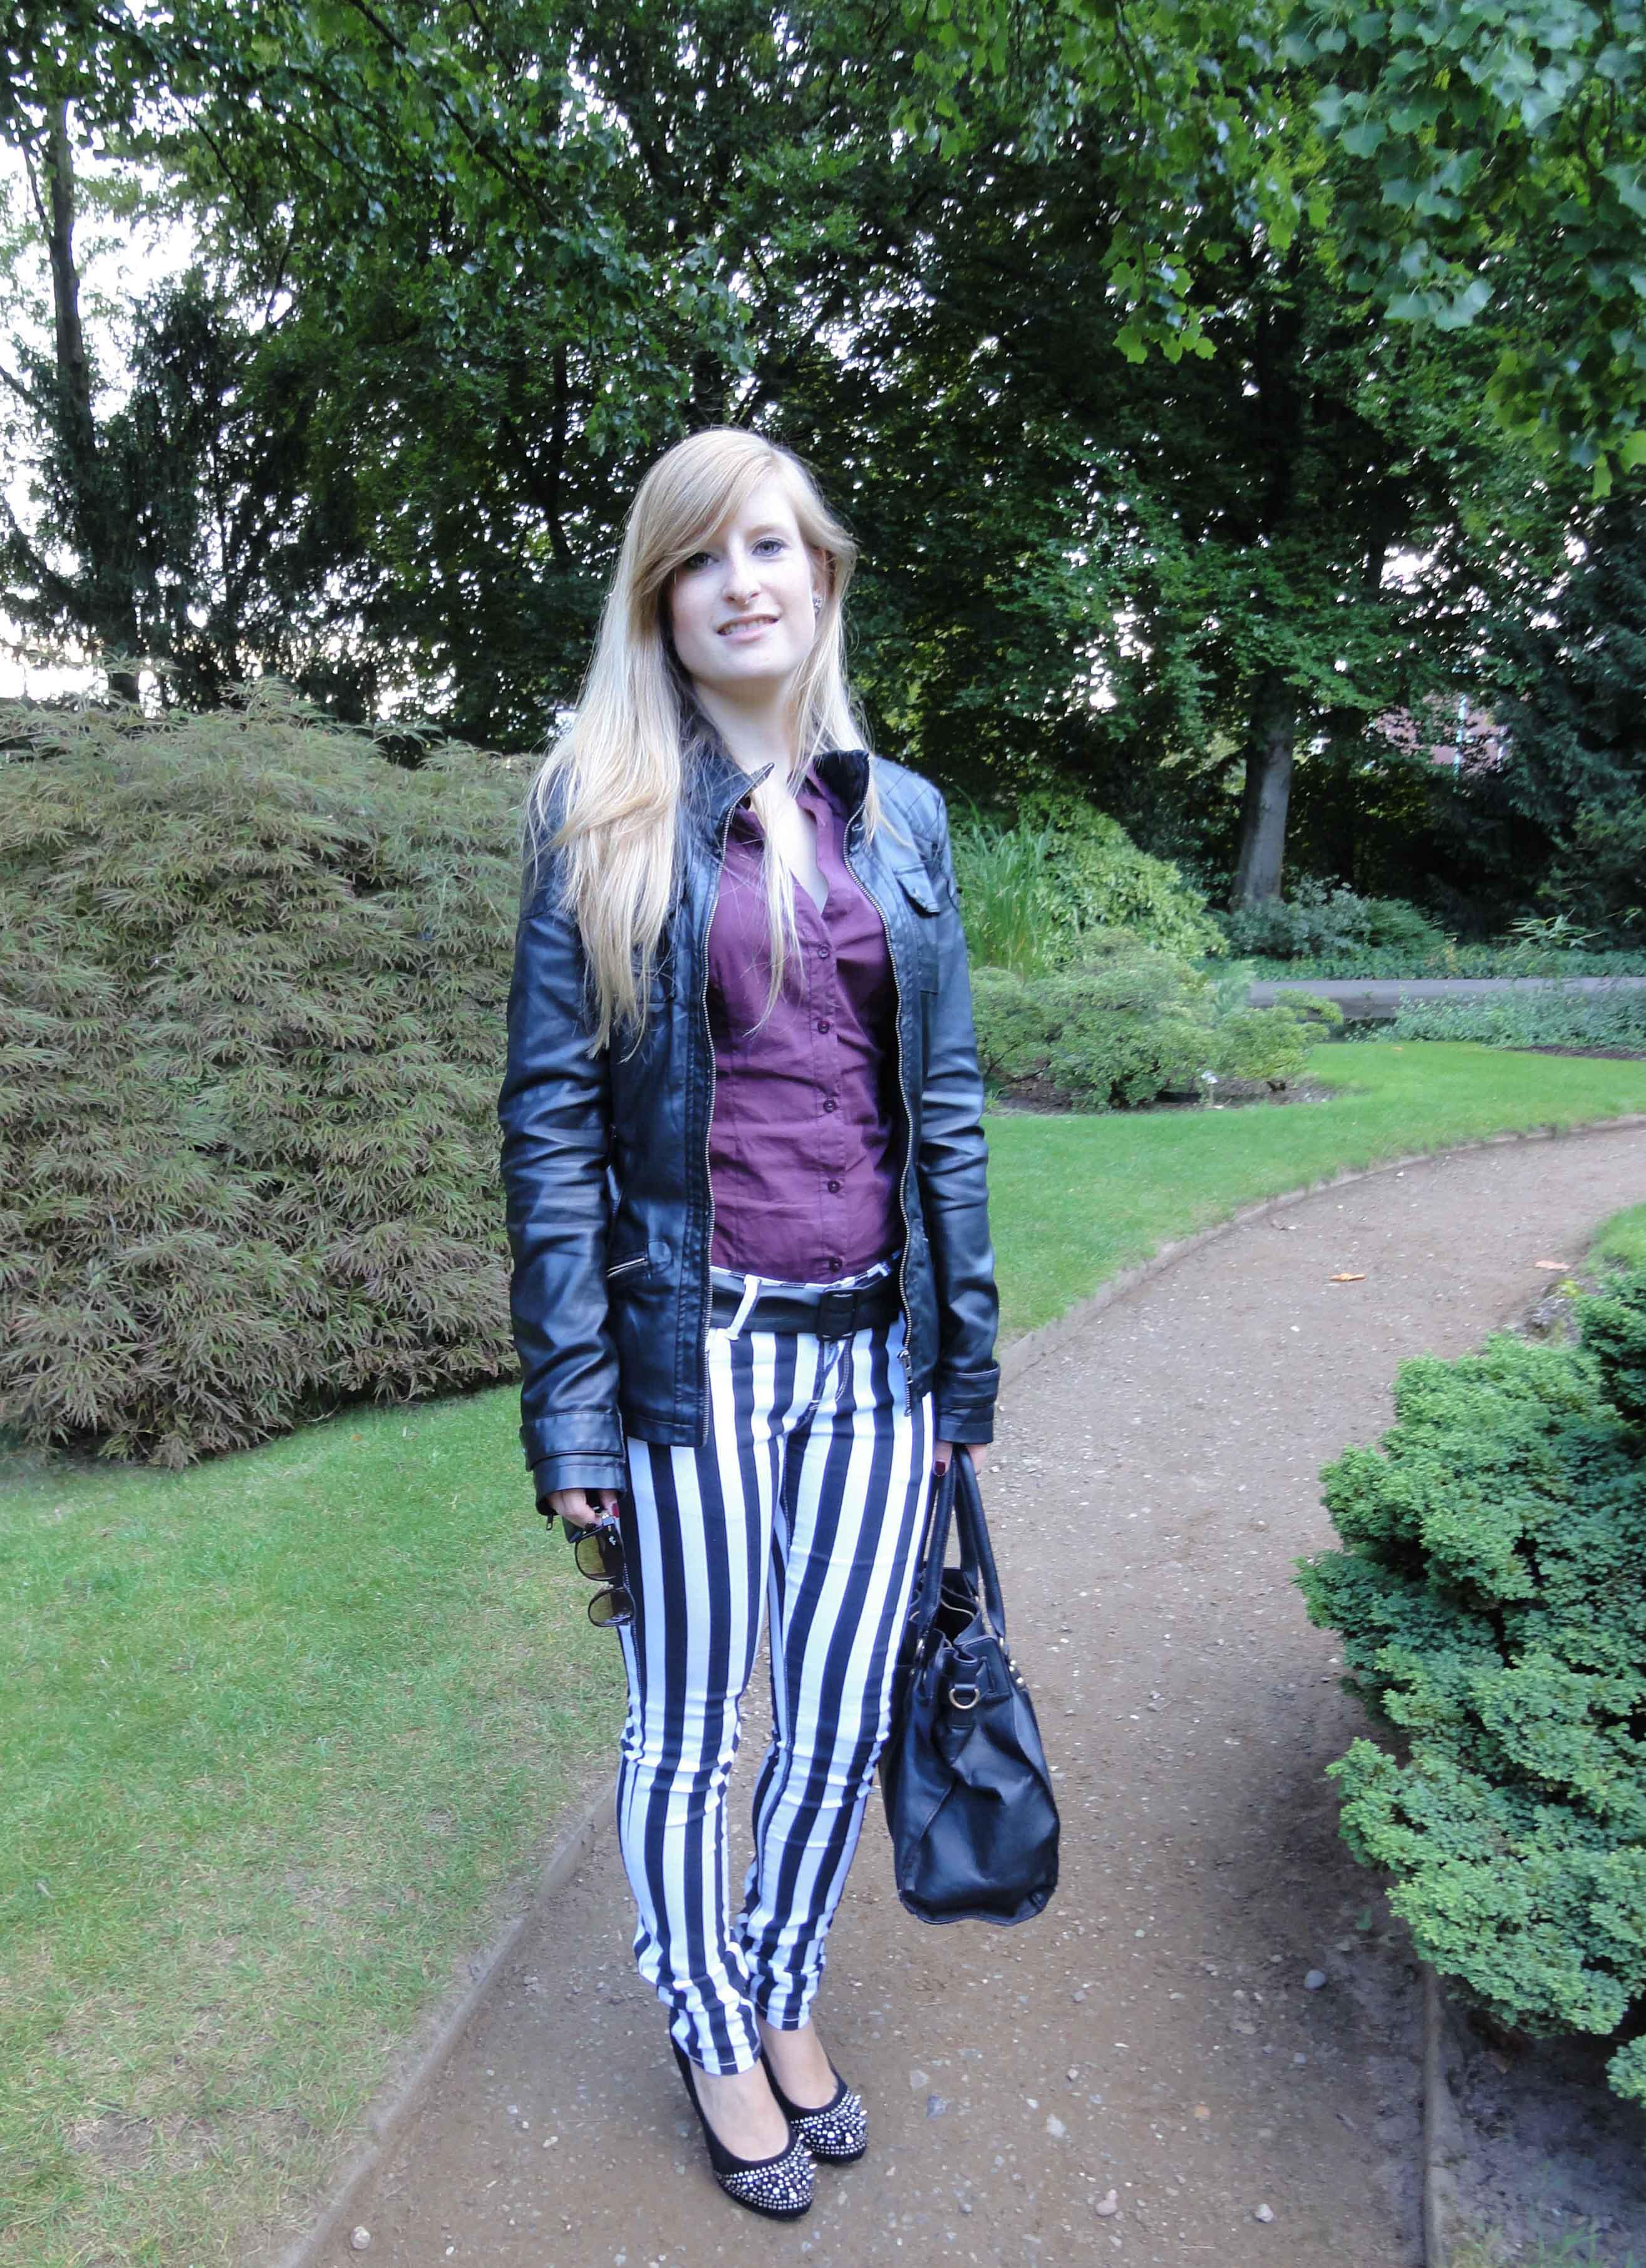 Stripes Rules Modeblog schwarz weiß gestreifte Hose kombinieren streifen Outfit schwarze Lederjacke jajpanischer Garten 5